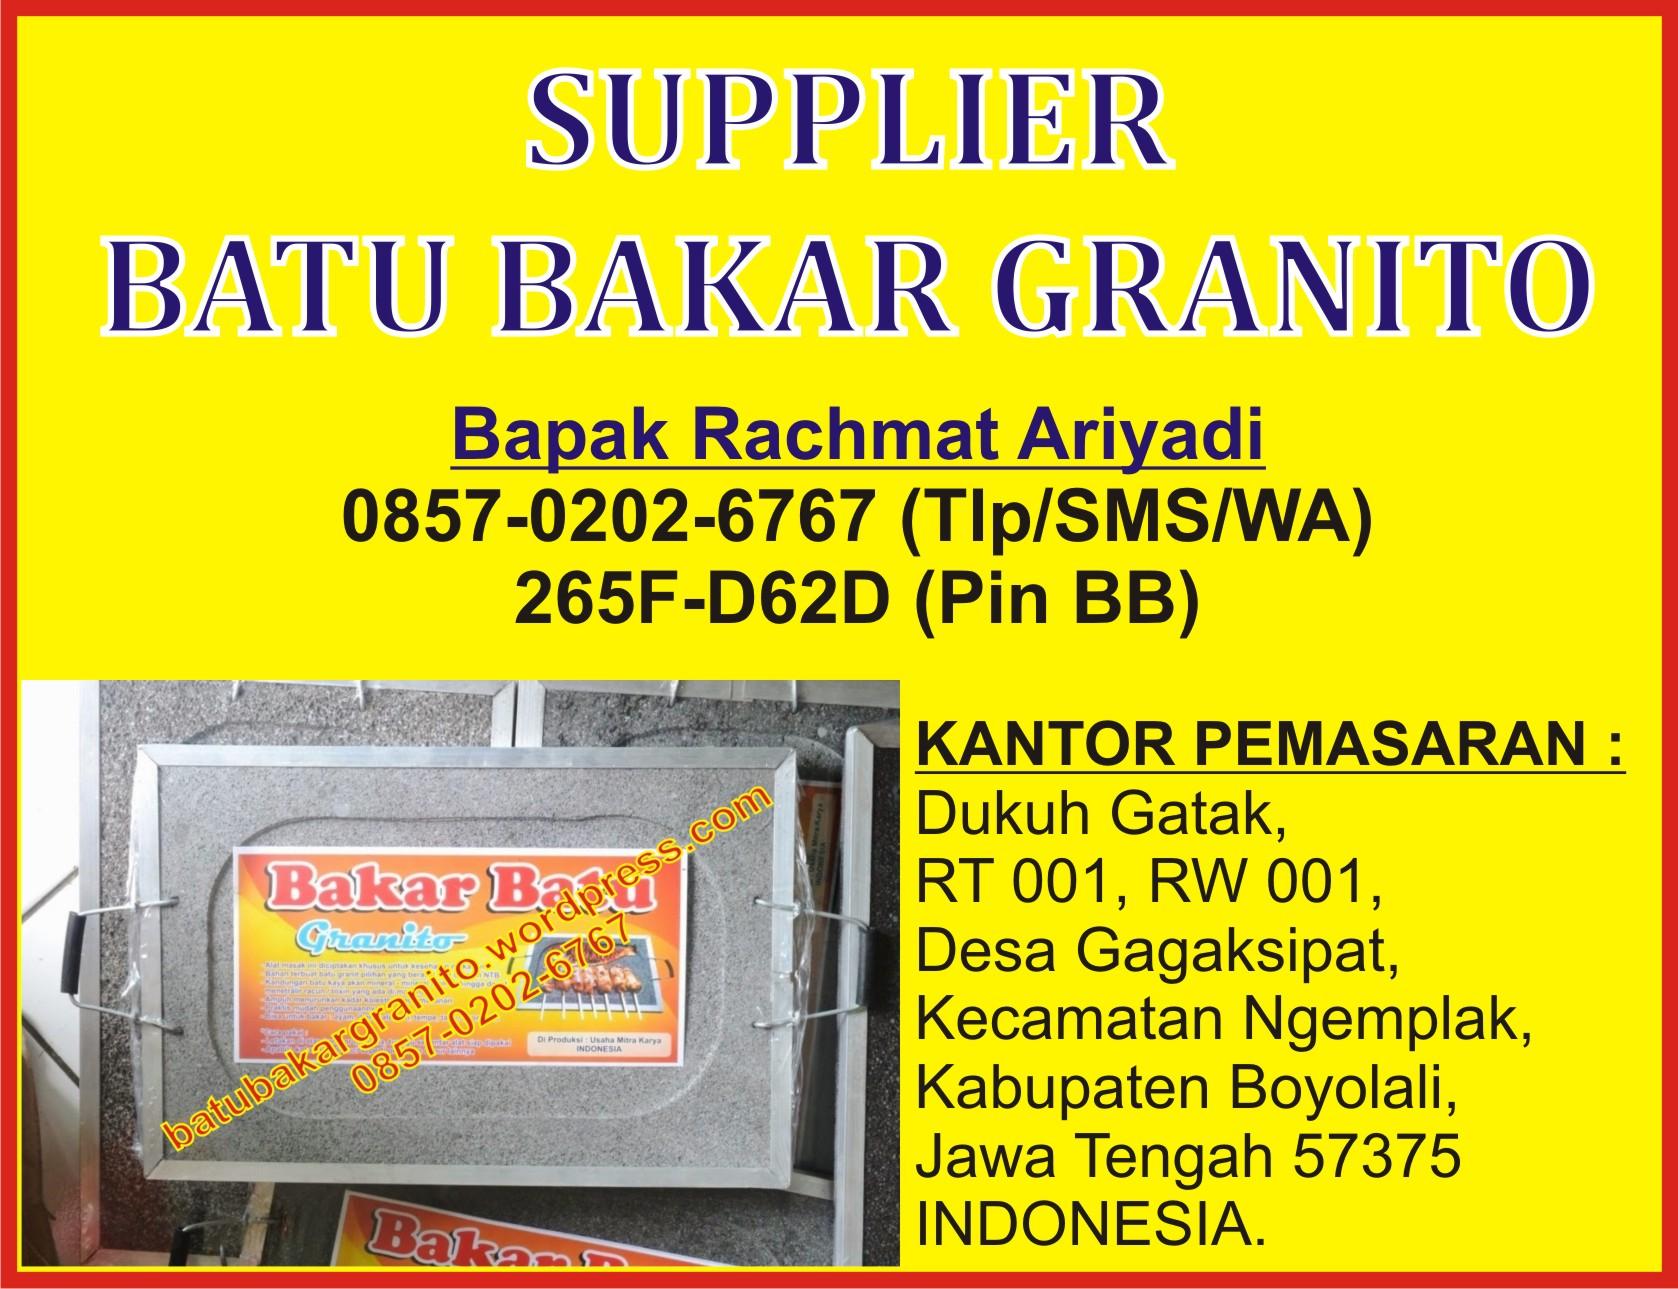 0857-0202-6767 (Indosat), Batu Bakar Granito, Bat Bakar Kirana